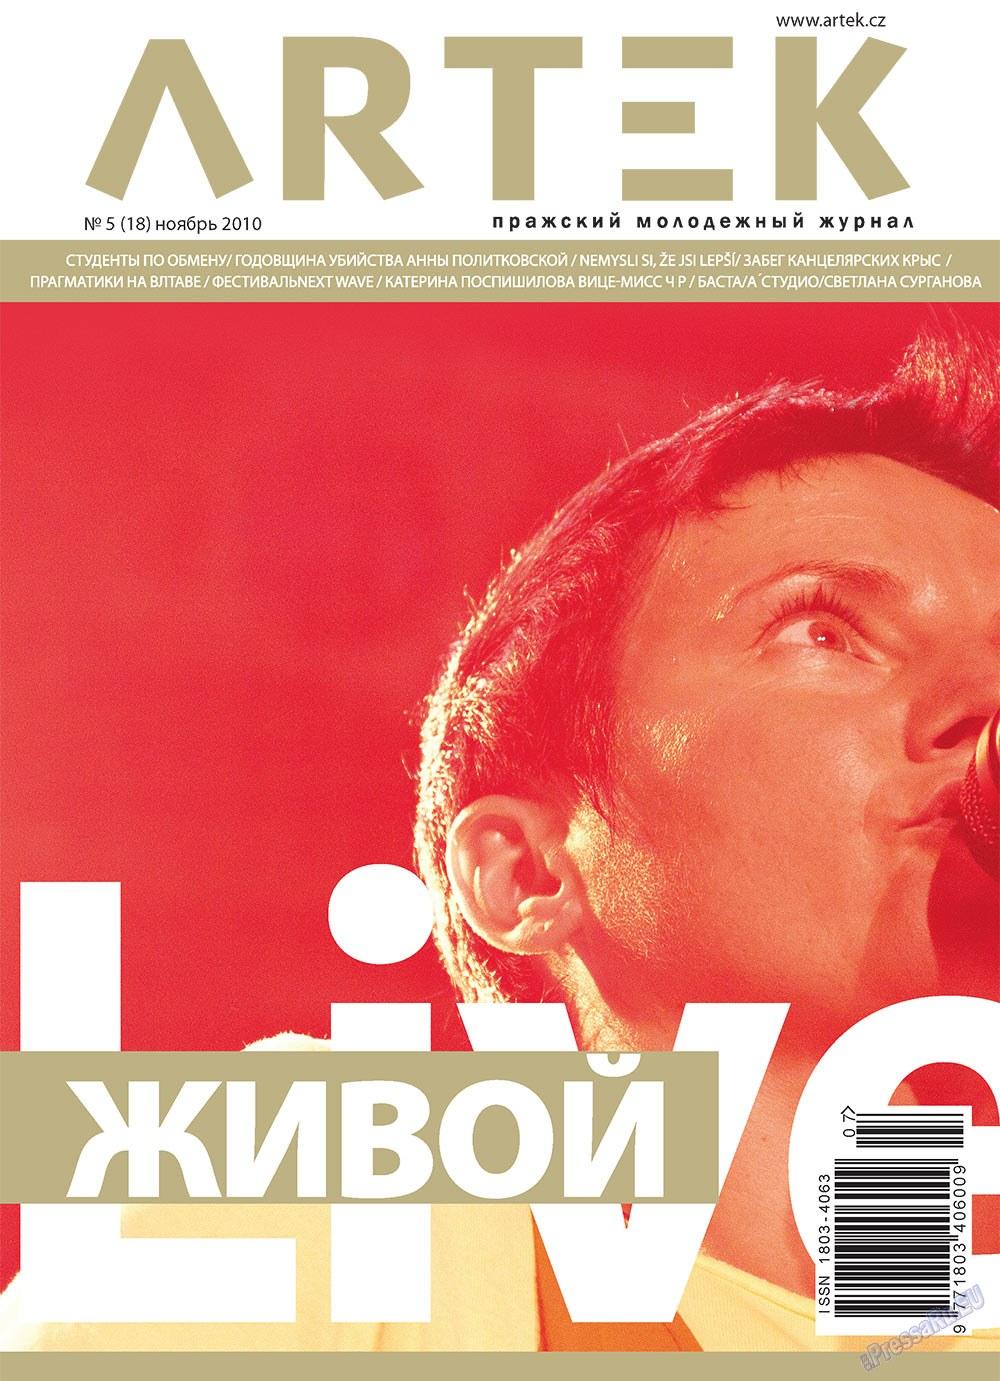 Артек (журнал). 2010 год, номер 5, стр. 1